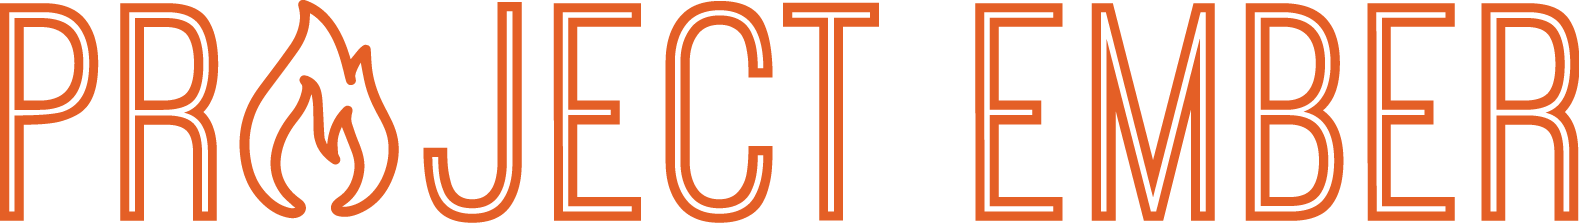 project-ember-logo-image